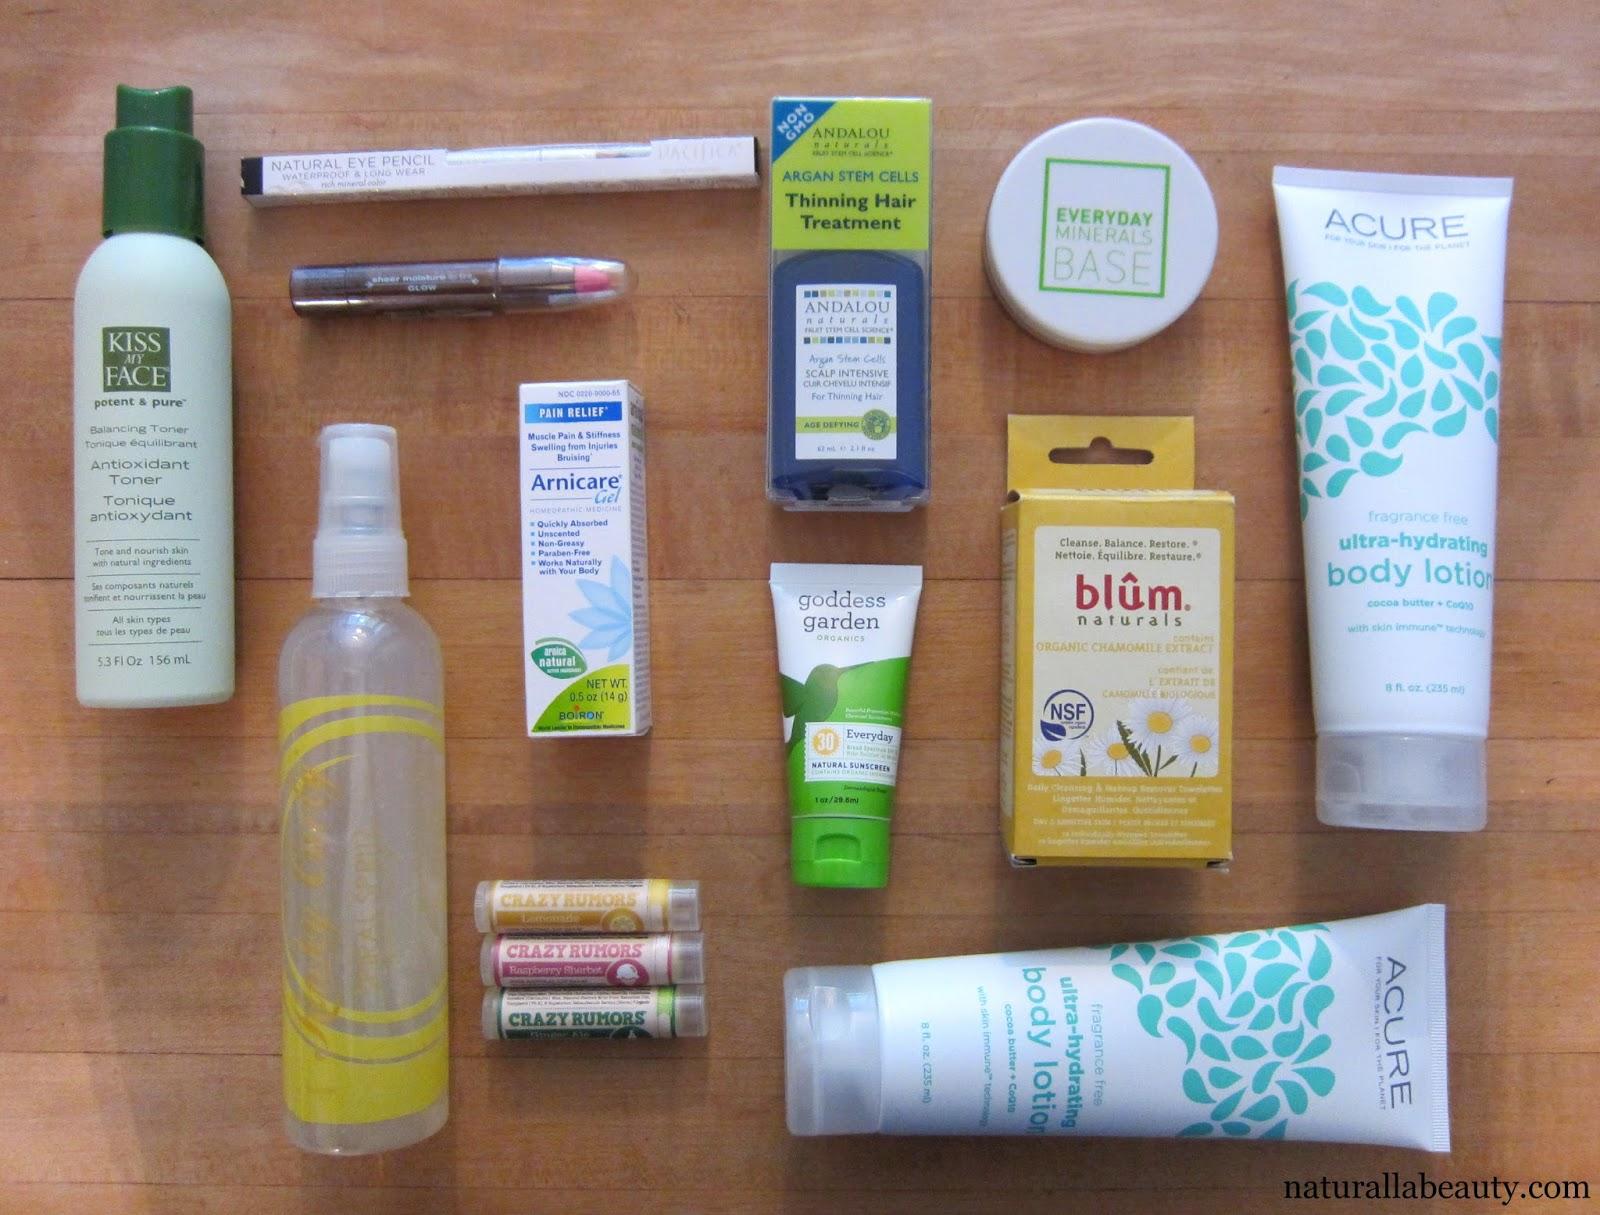 Naturalla Beauty: iHerb Haul #2: Makeup, Skincare, Hair + Body